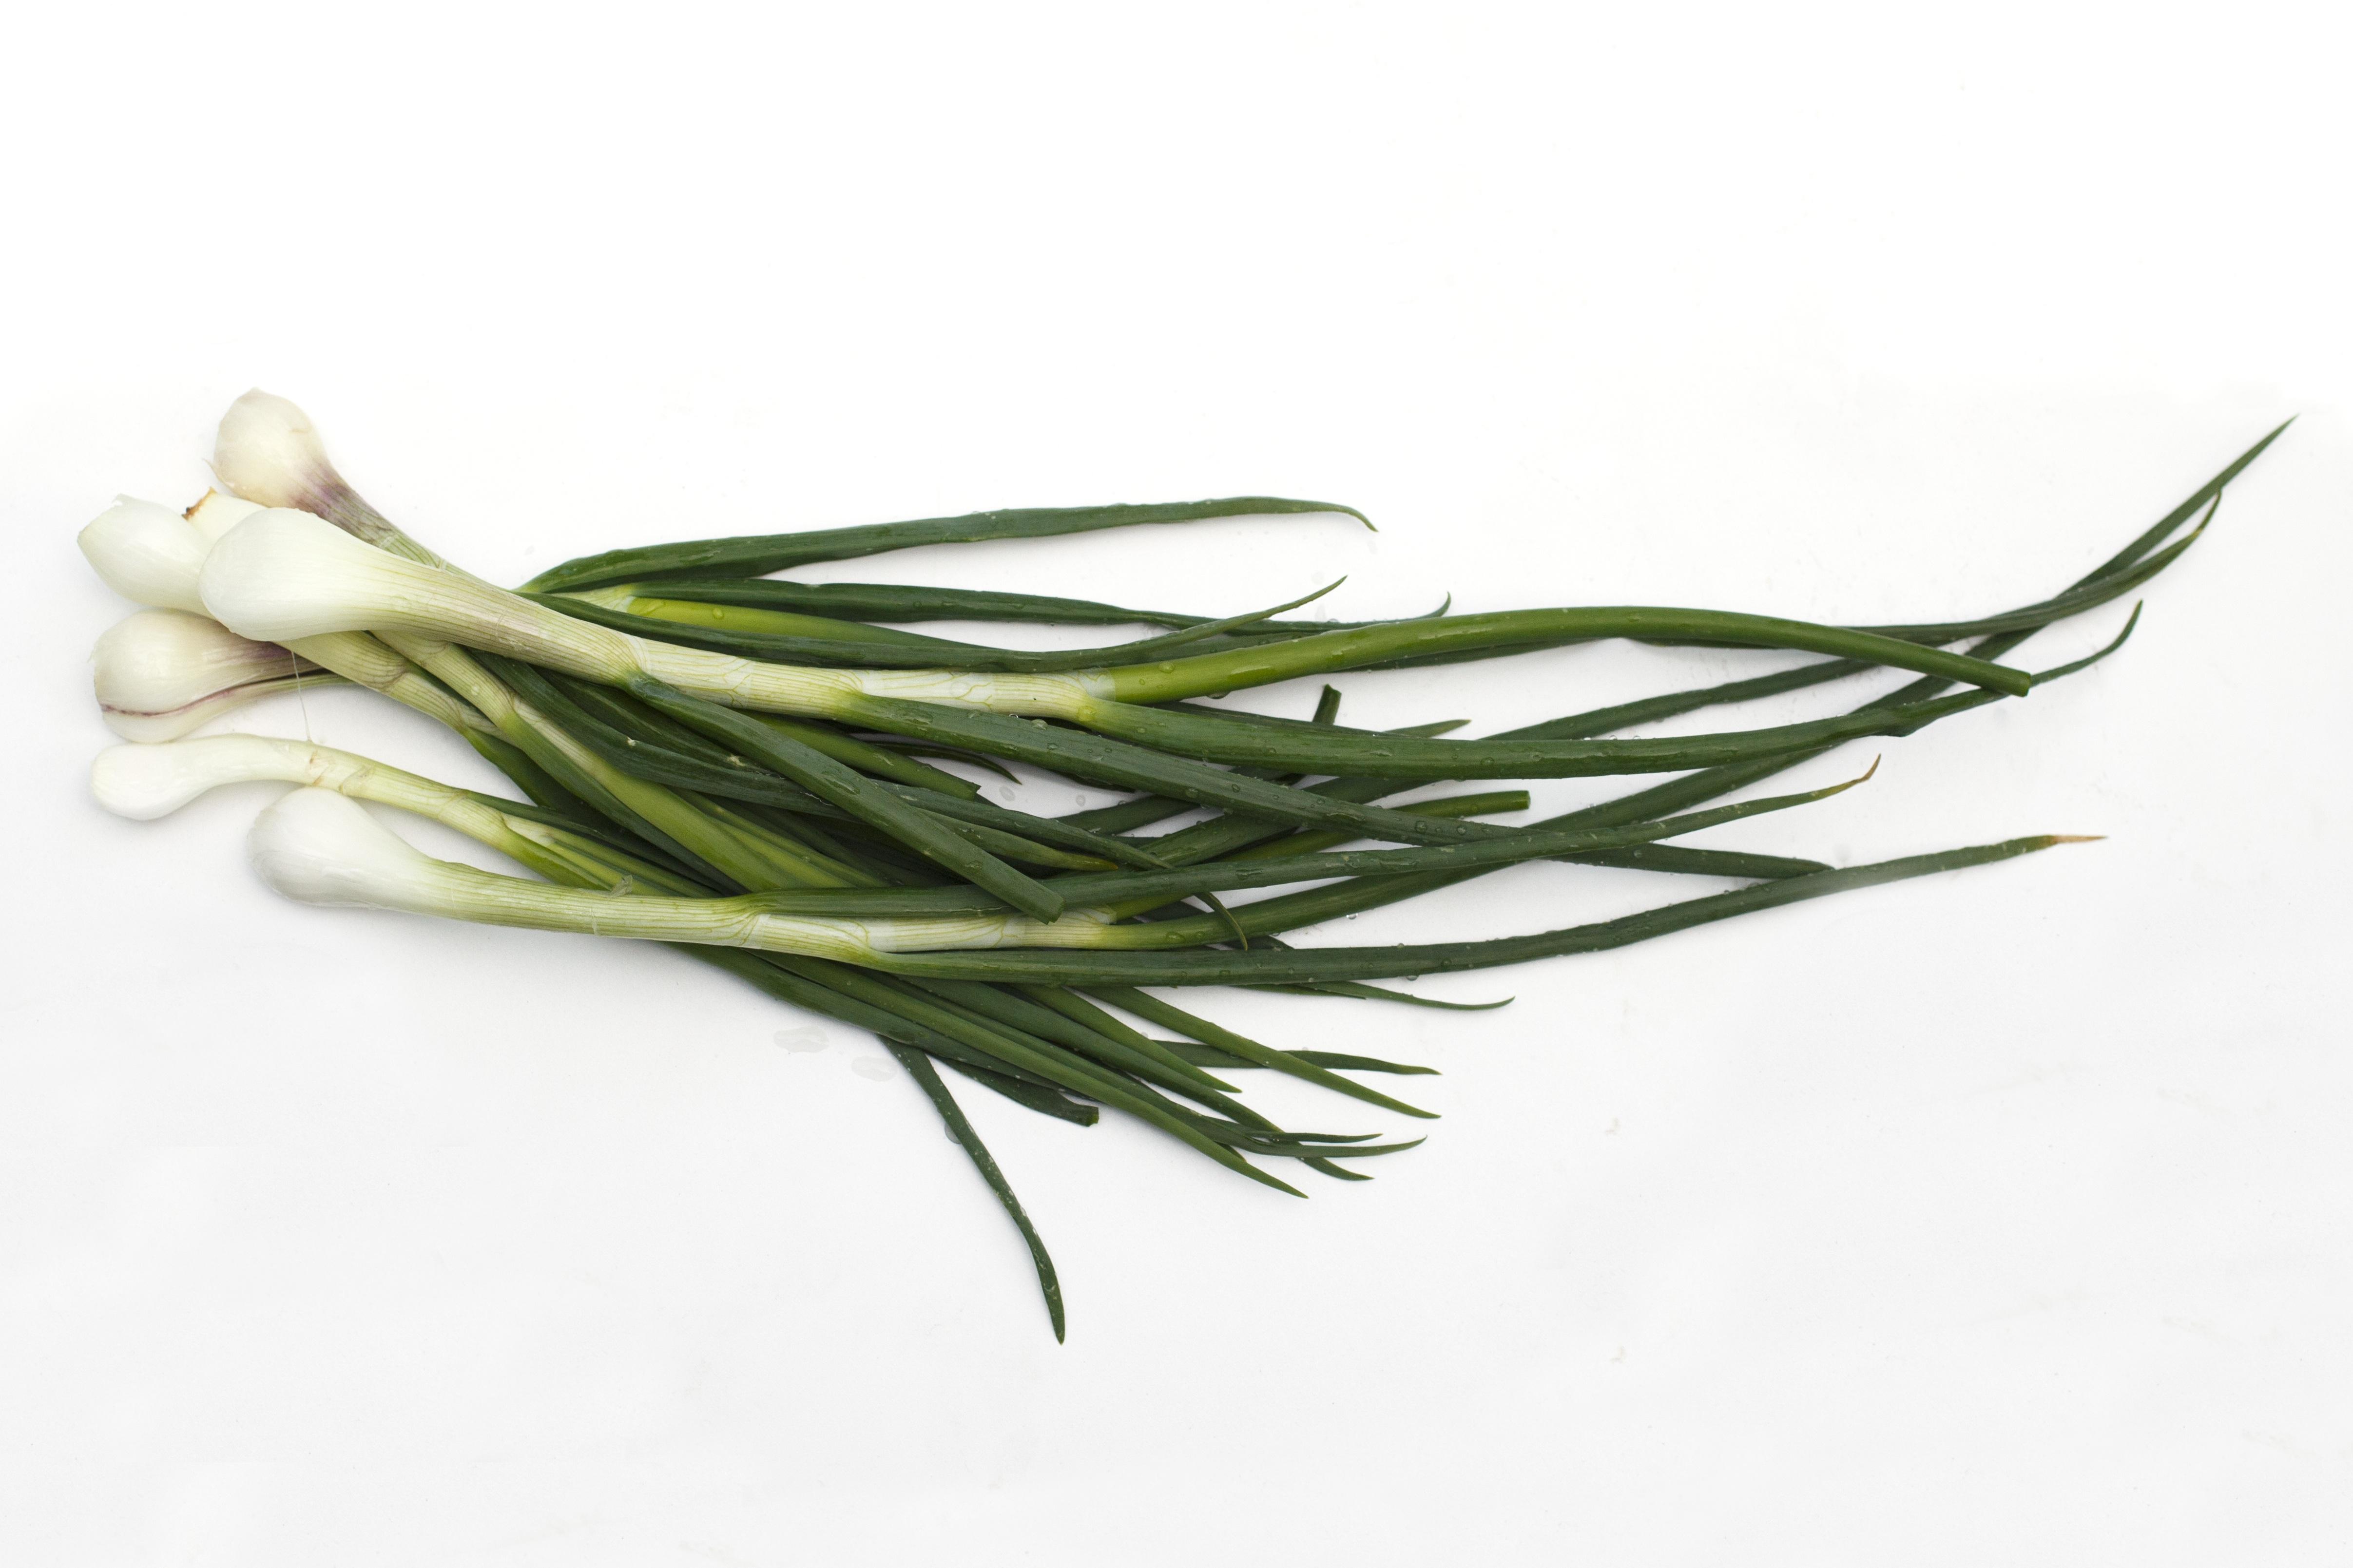 Зеленый лук фон картинки